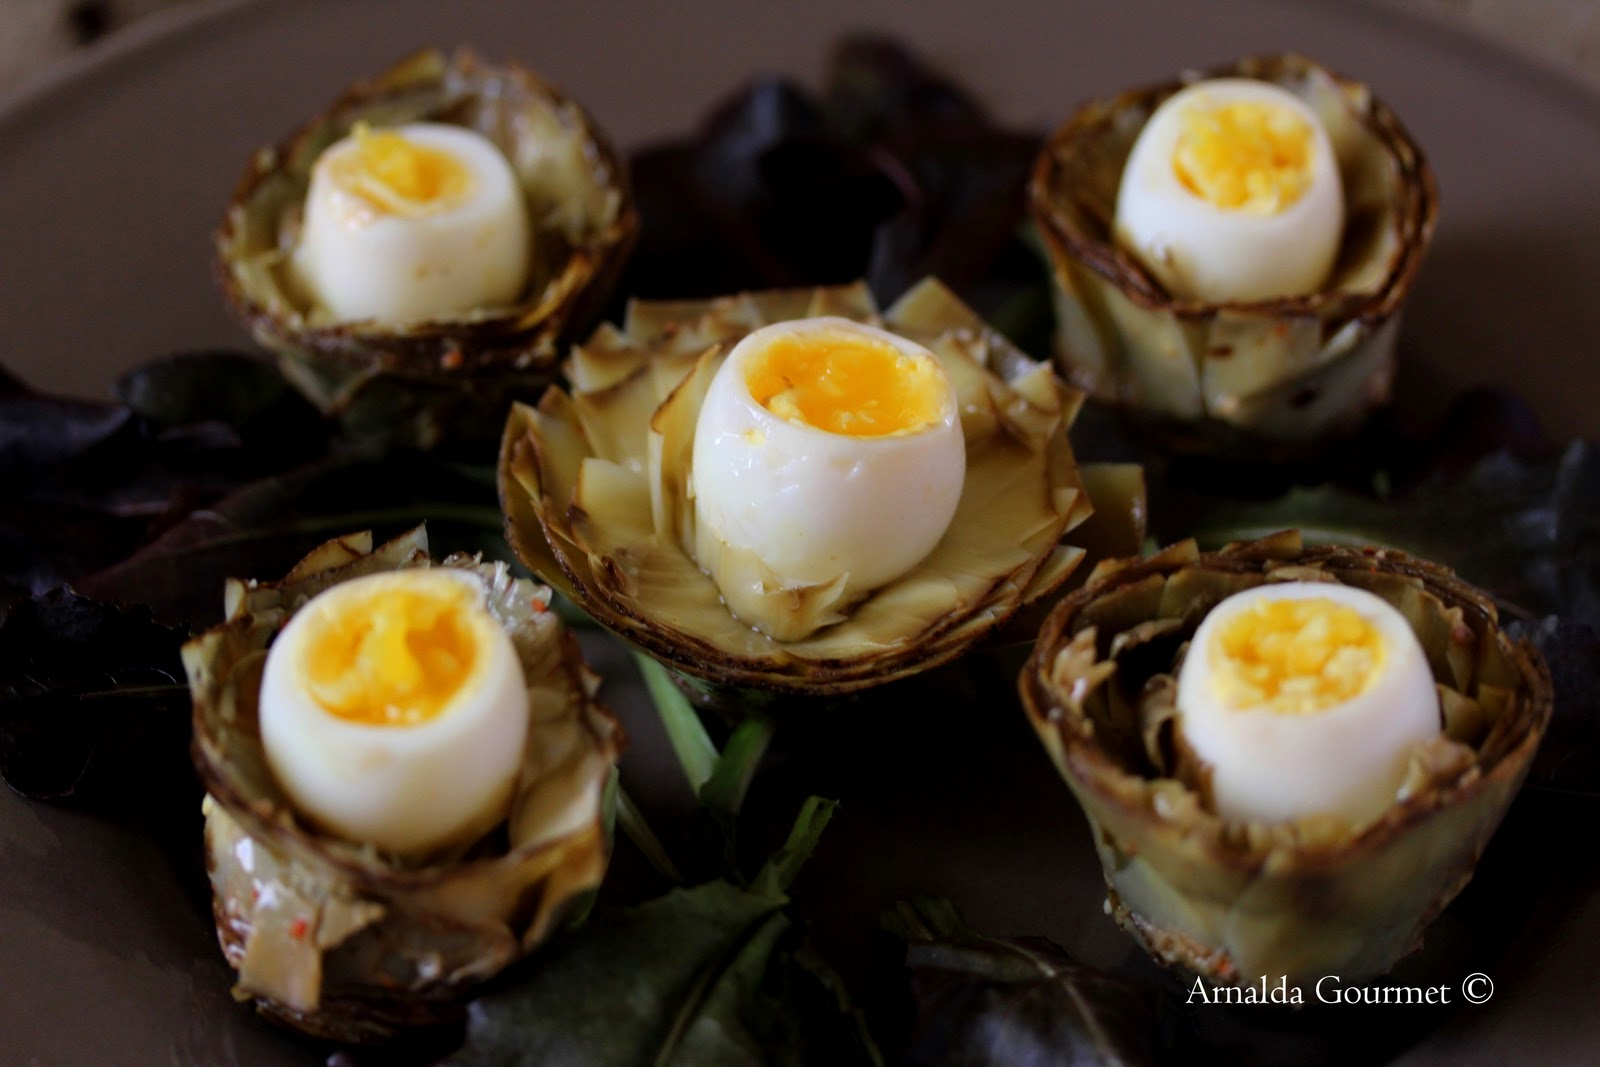 arnalda gourmet: carciofi sott'olio con uova di quaglia - Cucinare Uova Di Quaglia